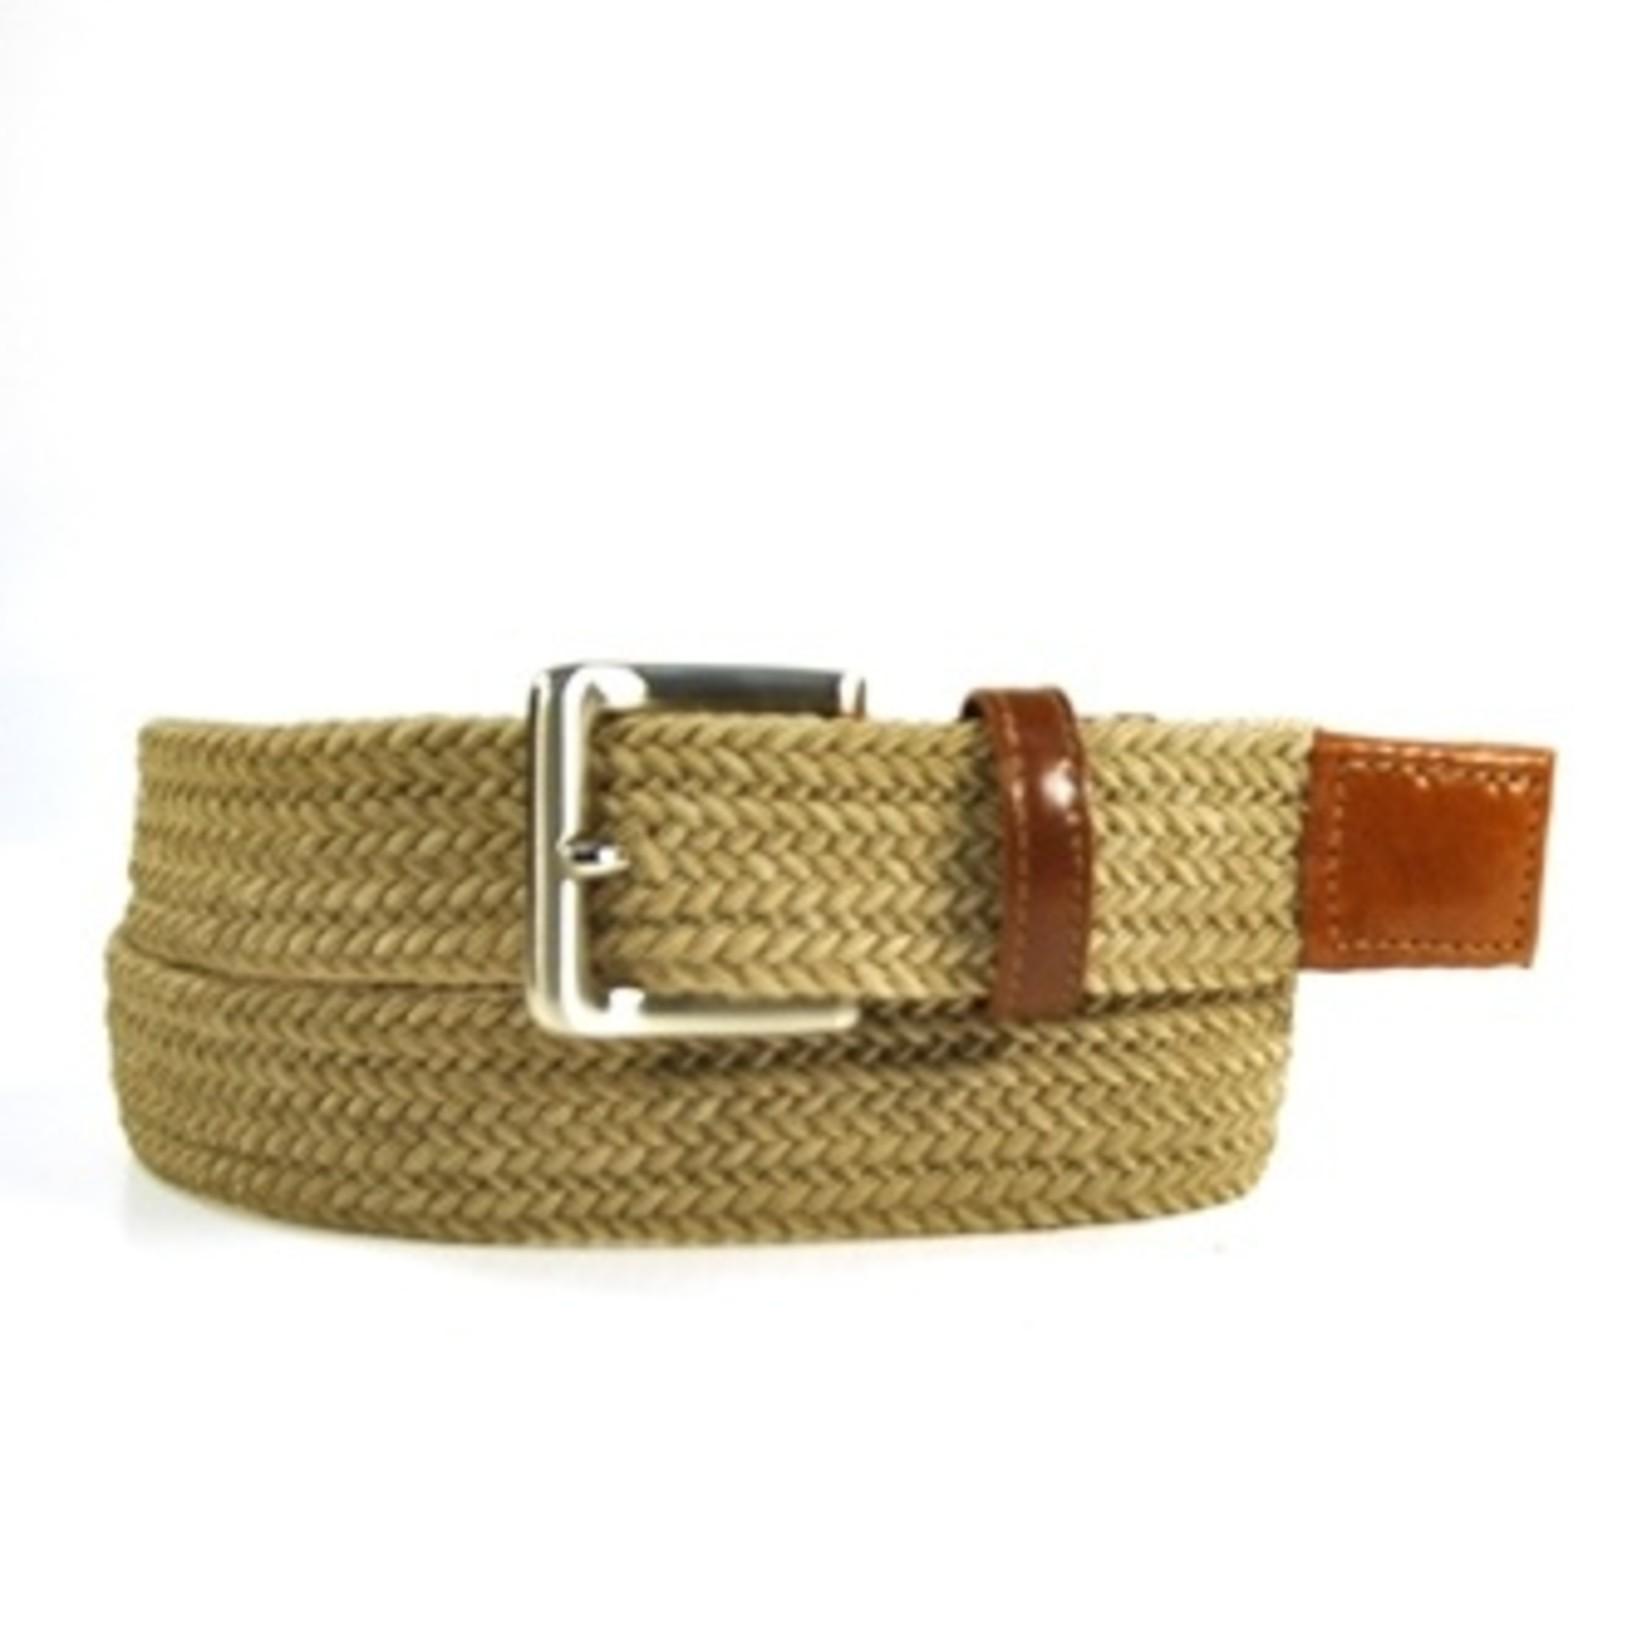 Benchcraft Benchcraft 3589 Fabric Braided Belt -